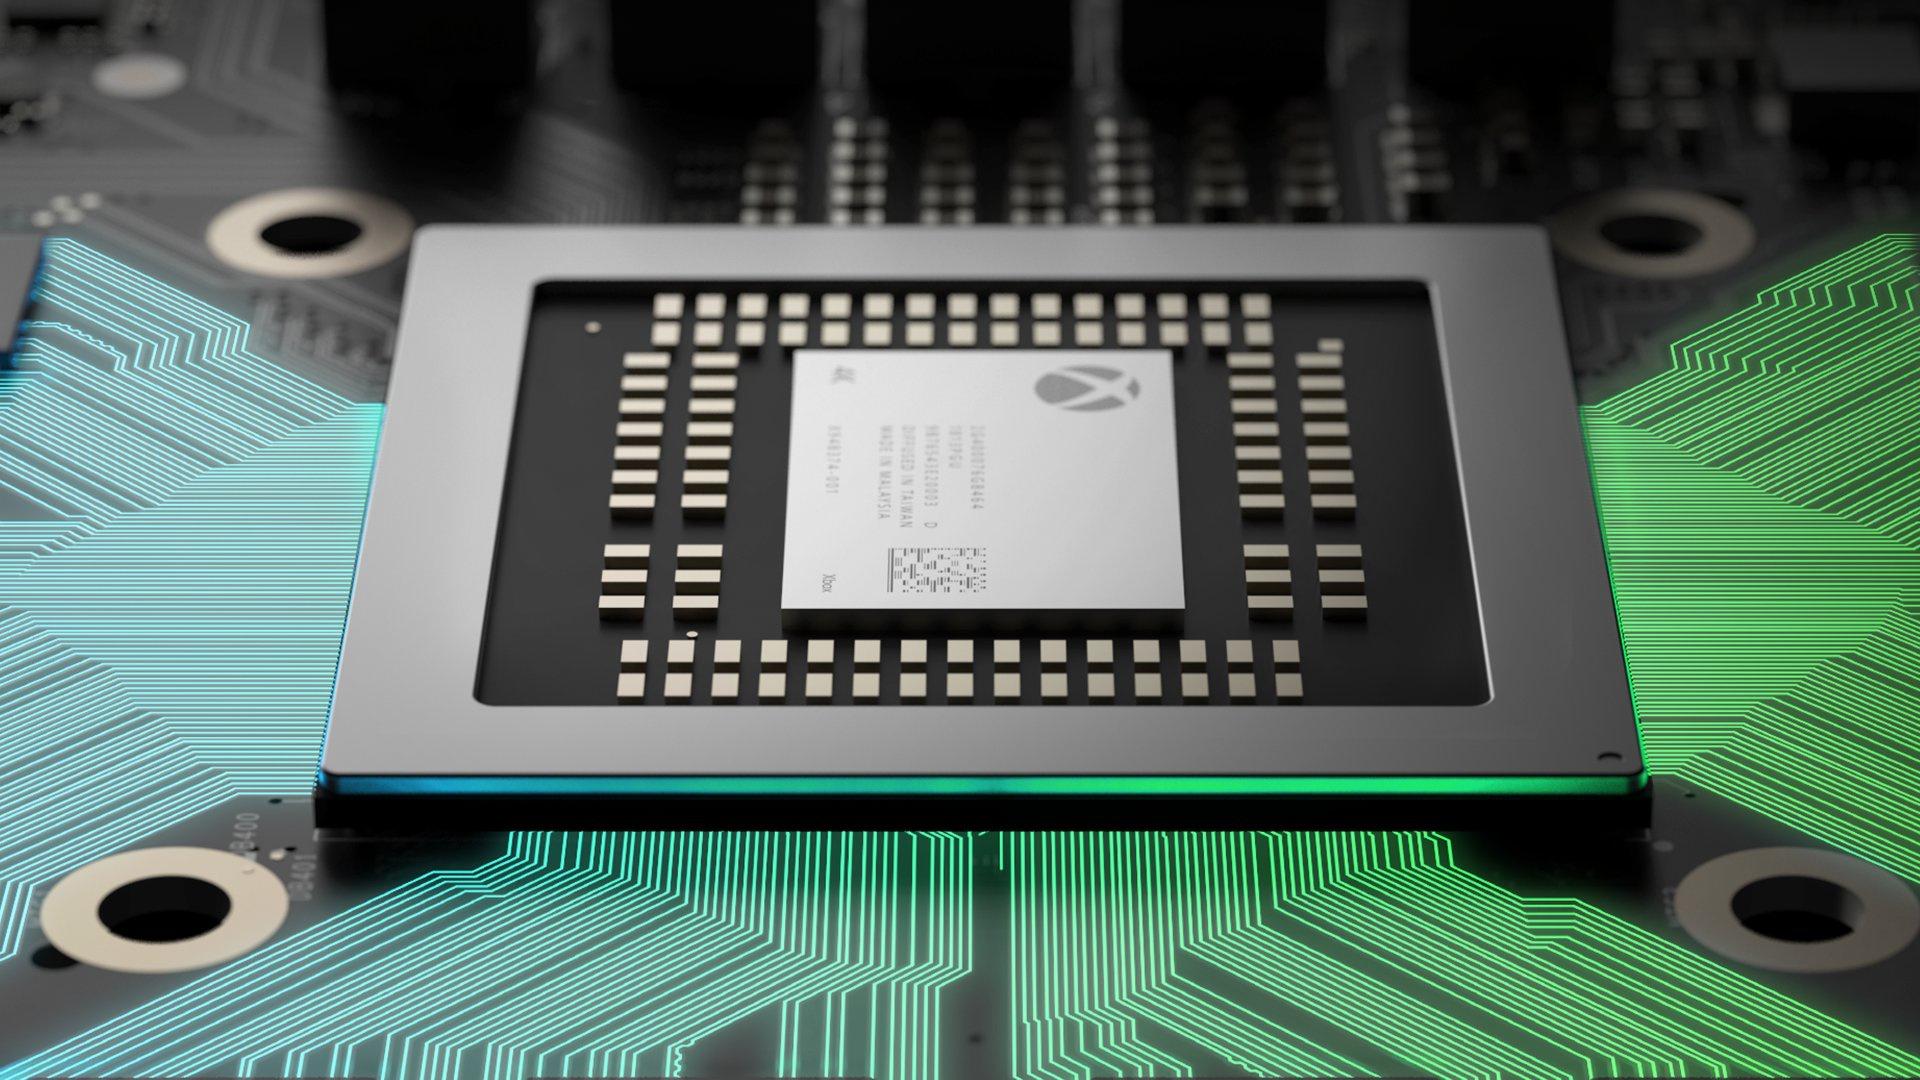 Характеристики Xbox Project Scorpio станут известны на текущей неделе